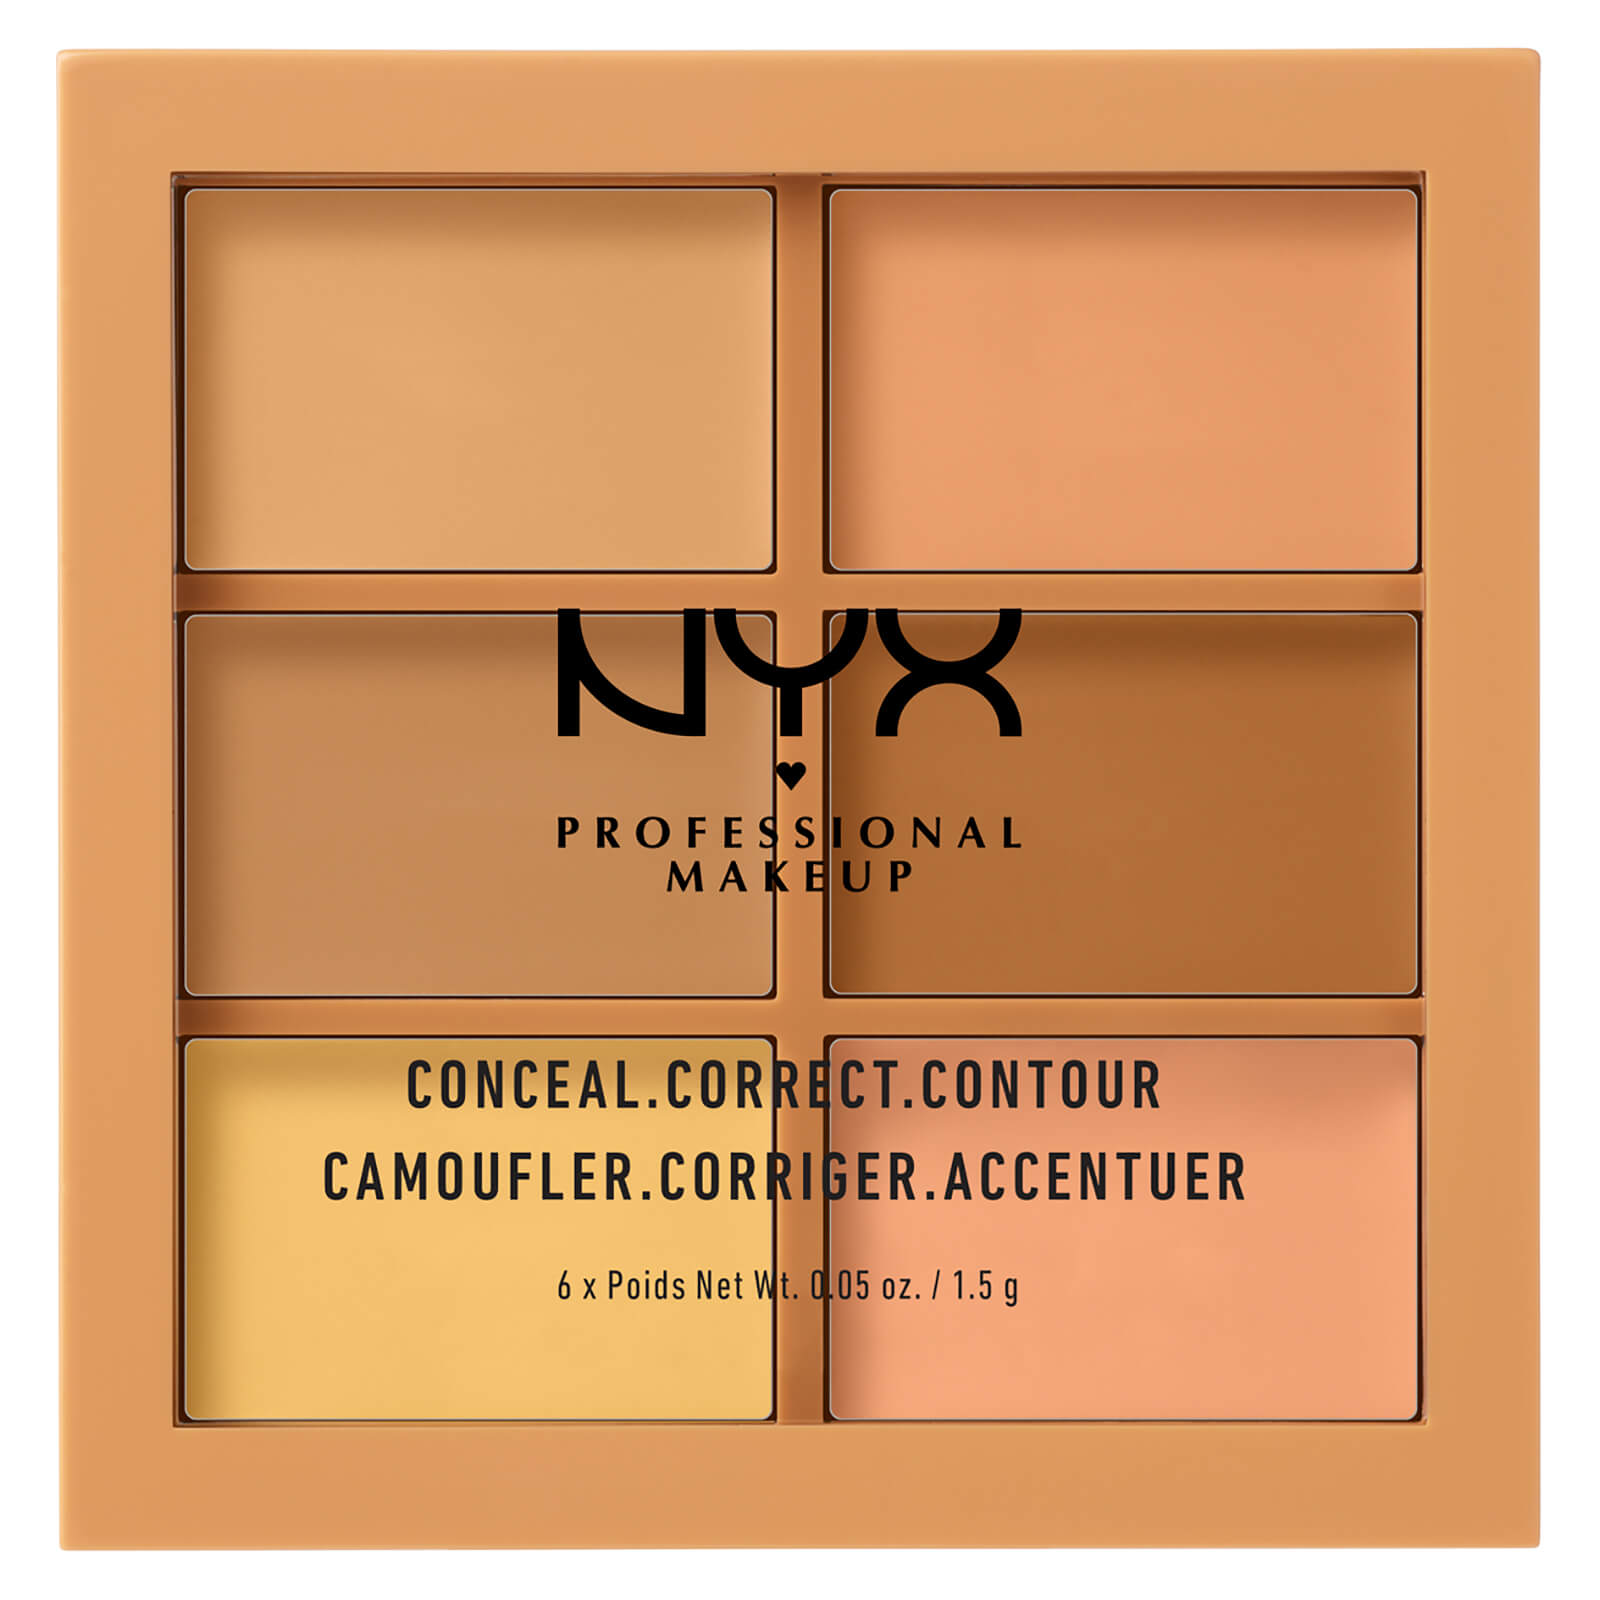 Купить Палетка NYX Professional Makeup 3C Palette - Conceal, Correct, Contour - Medium